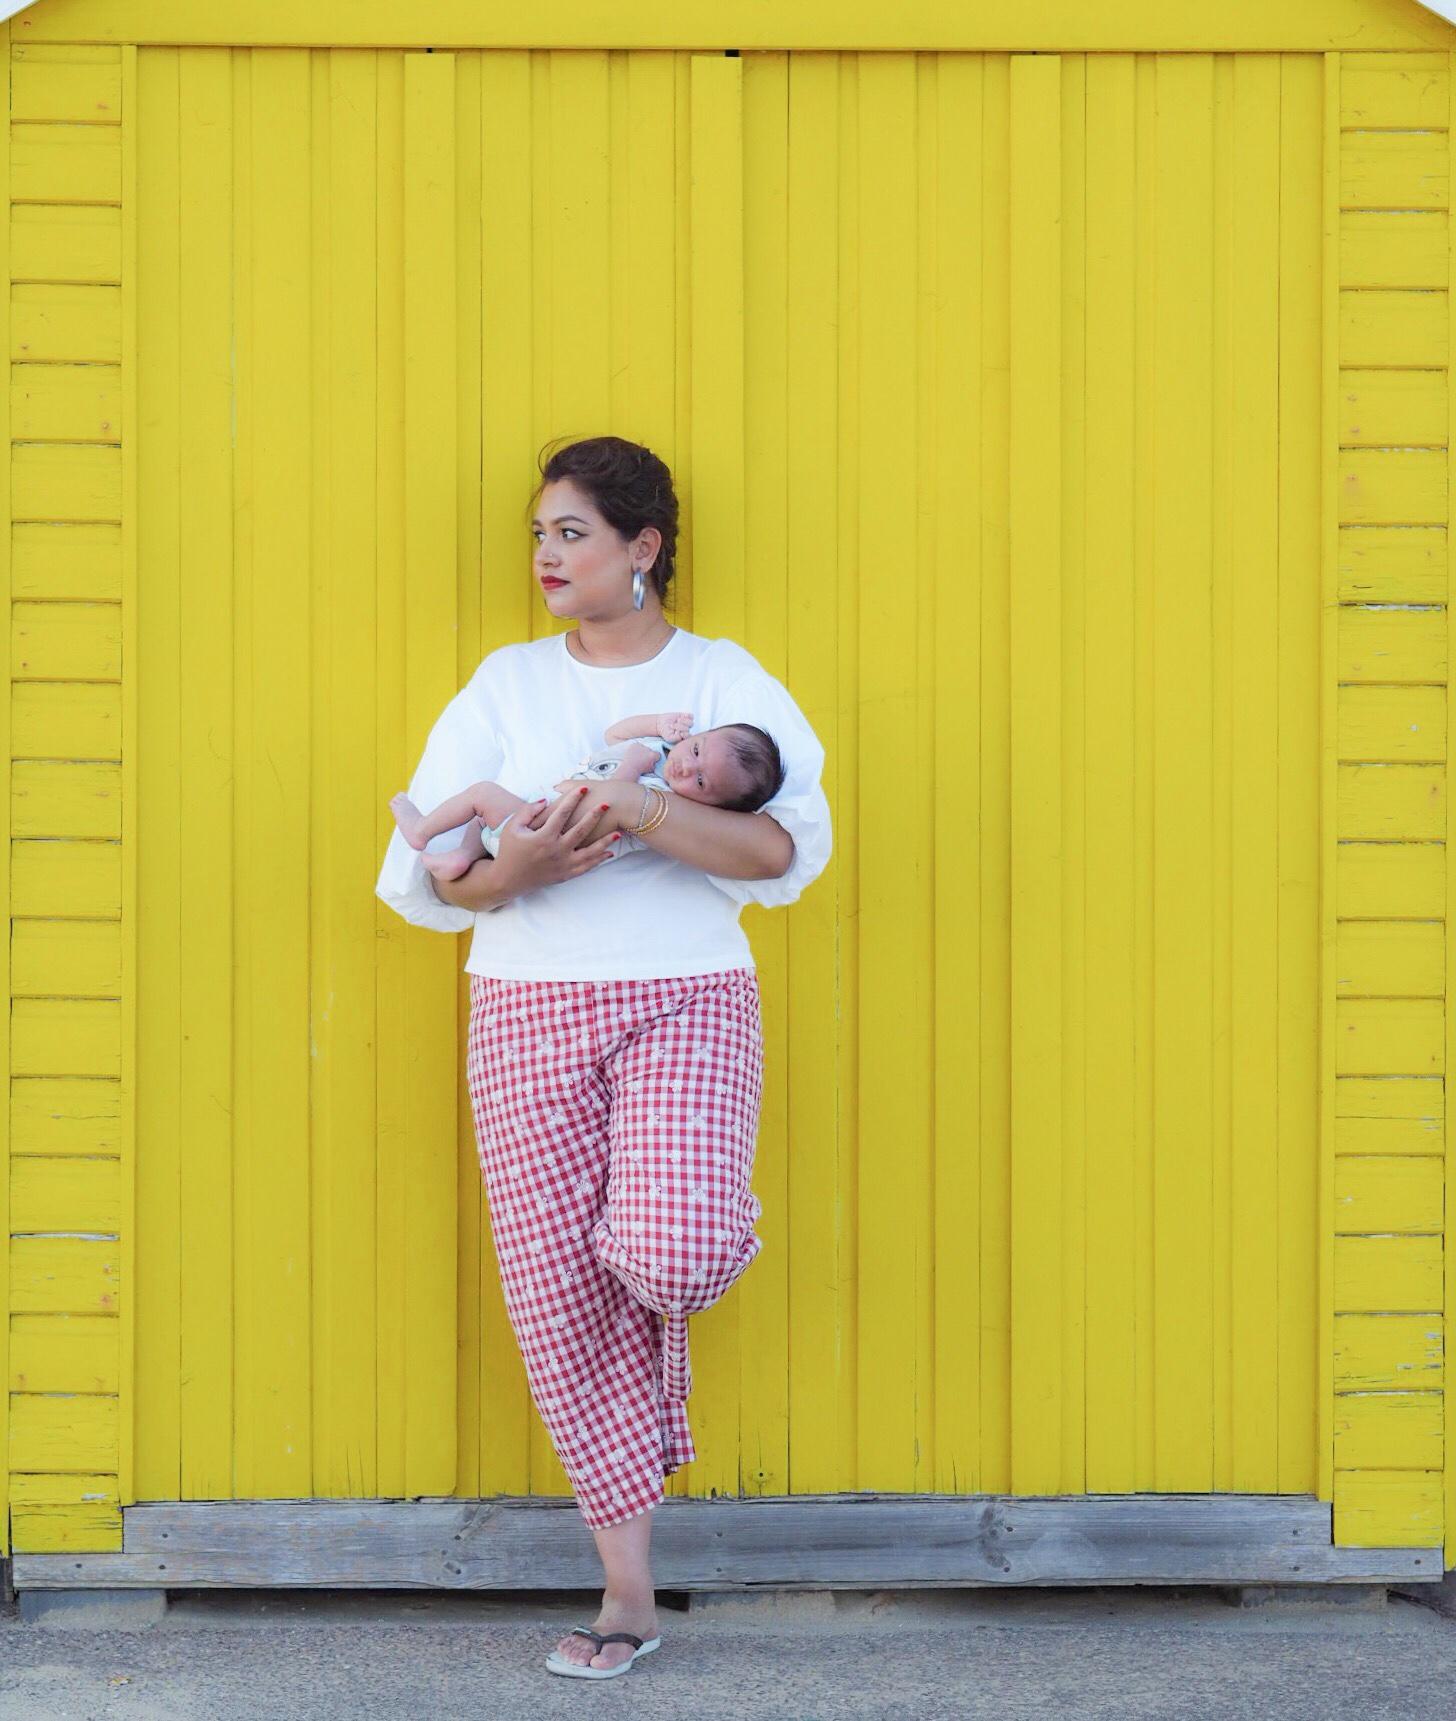 Motherhood: The First Month